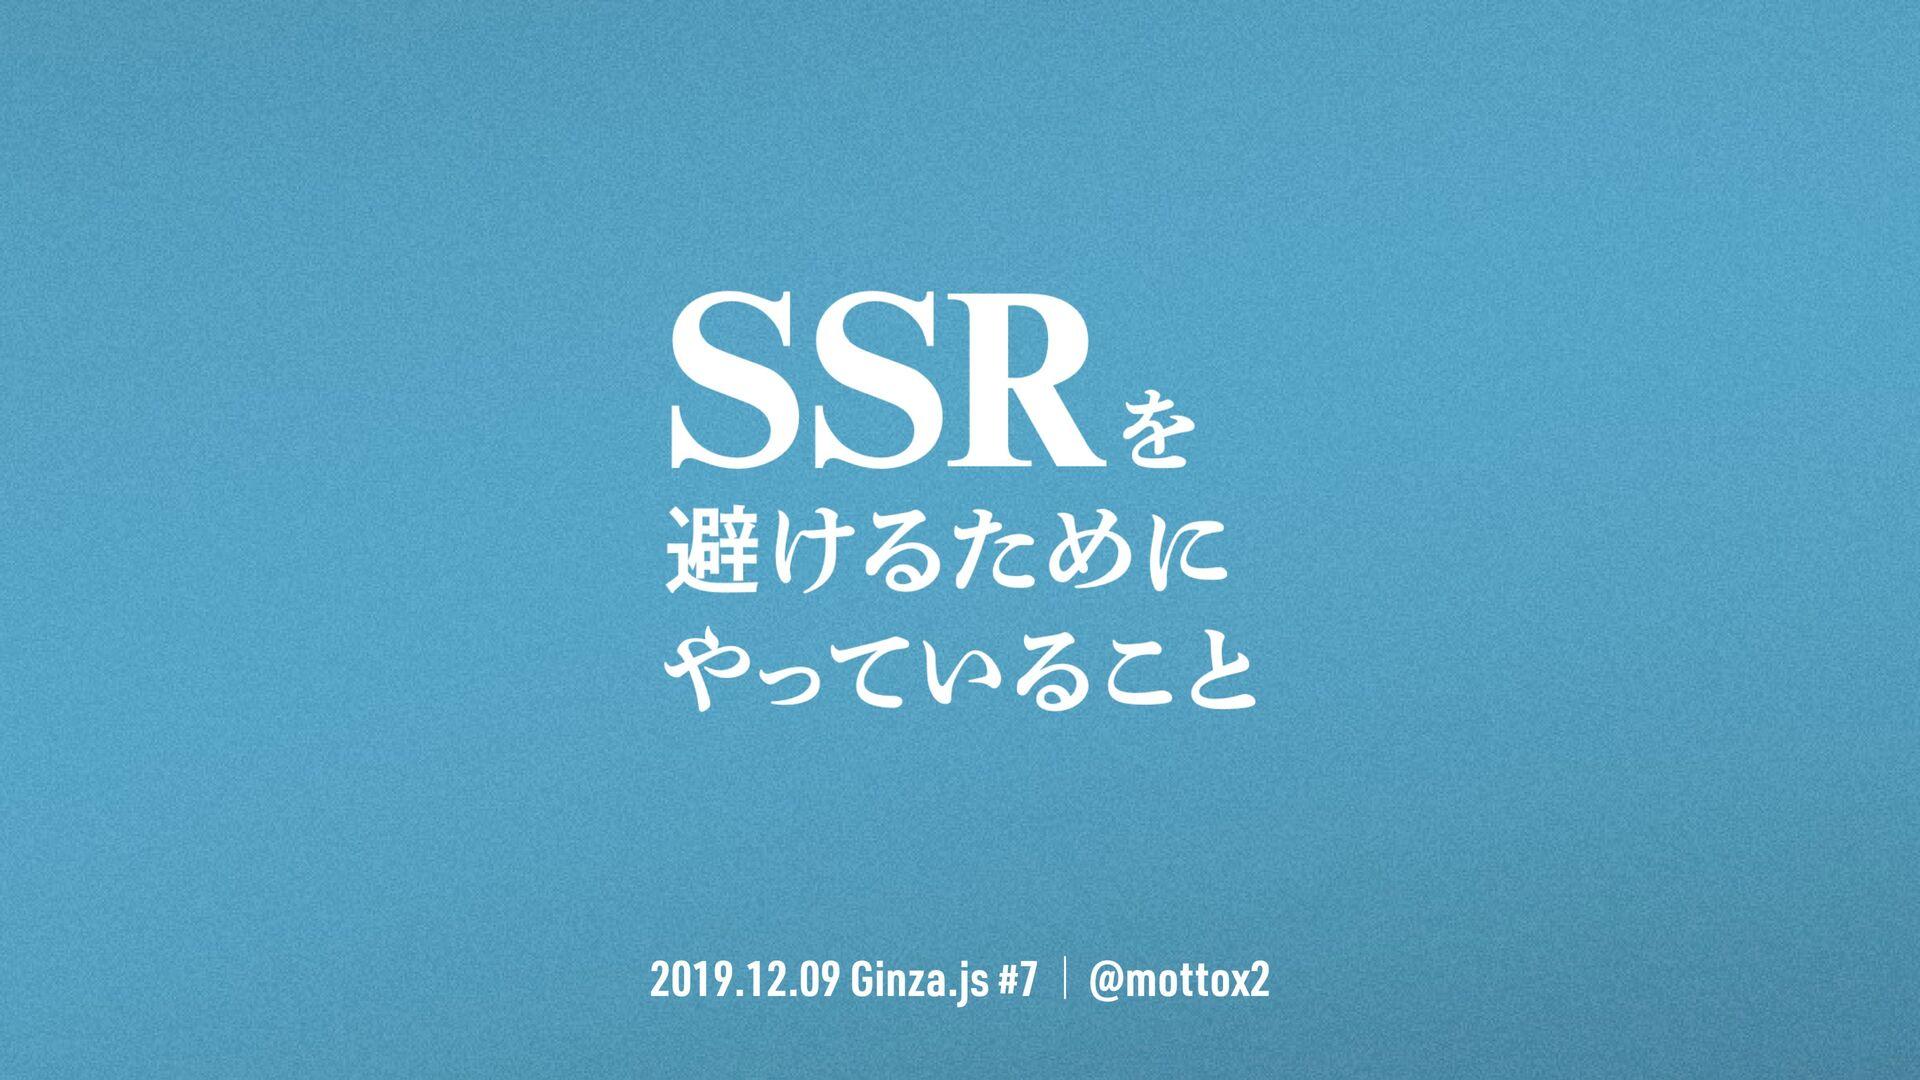 2019.12.9 Ginza.js #7 / @mottox2 SSRを避けるために やって...